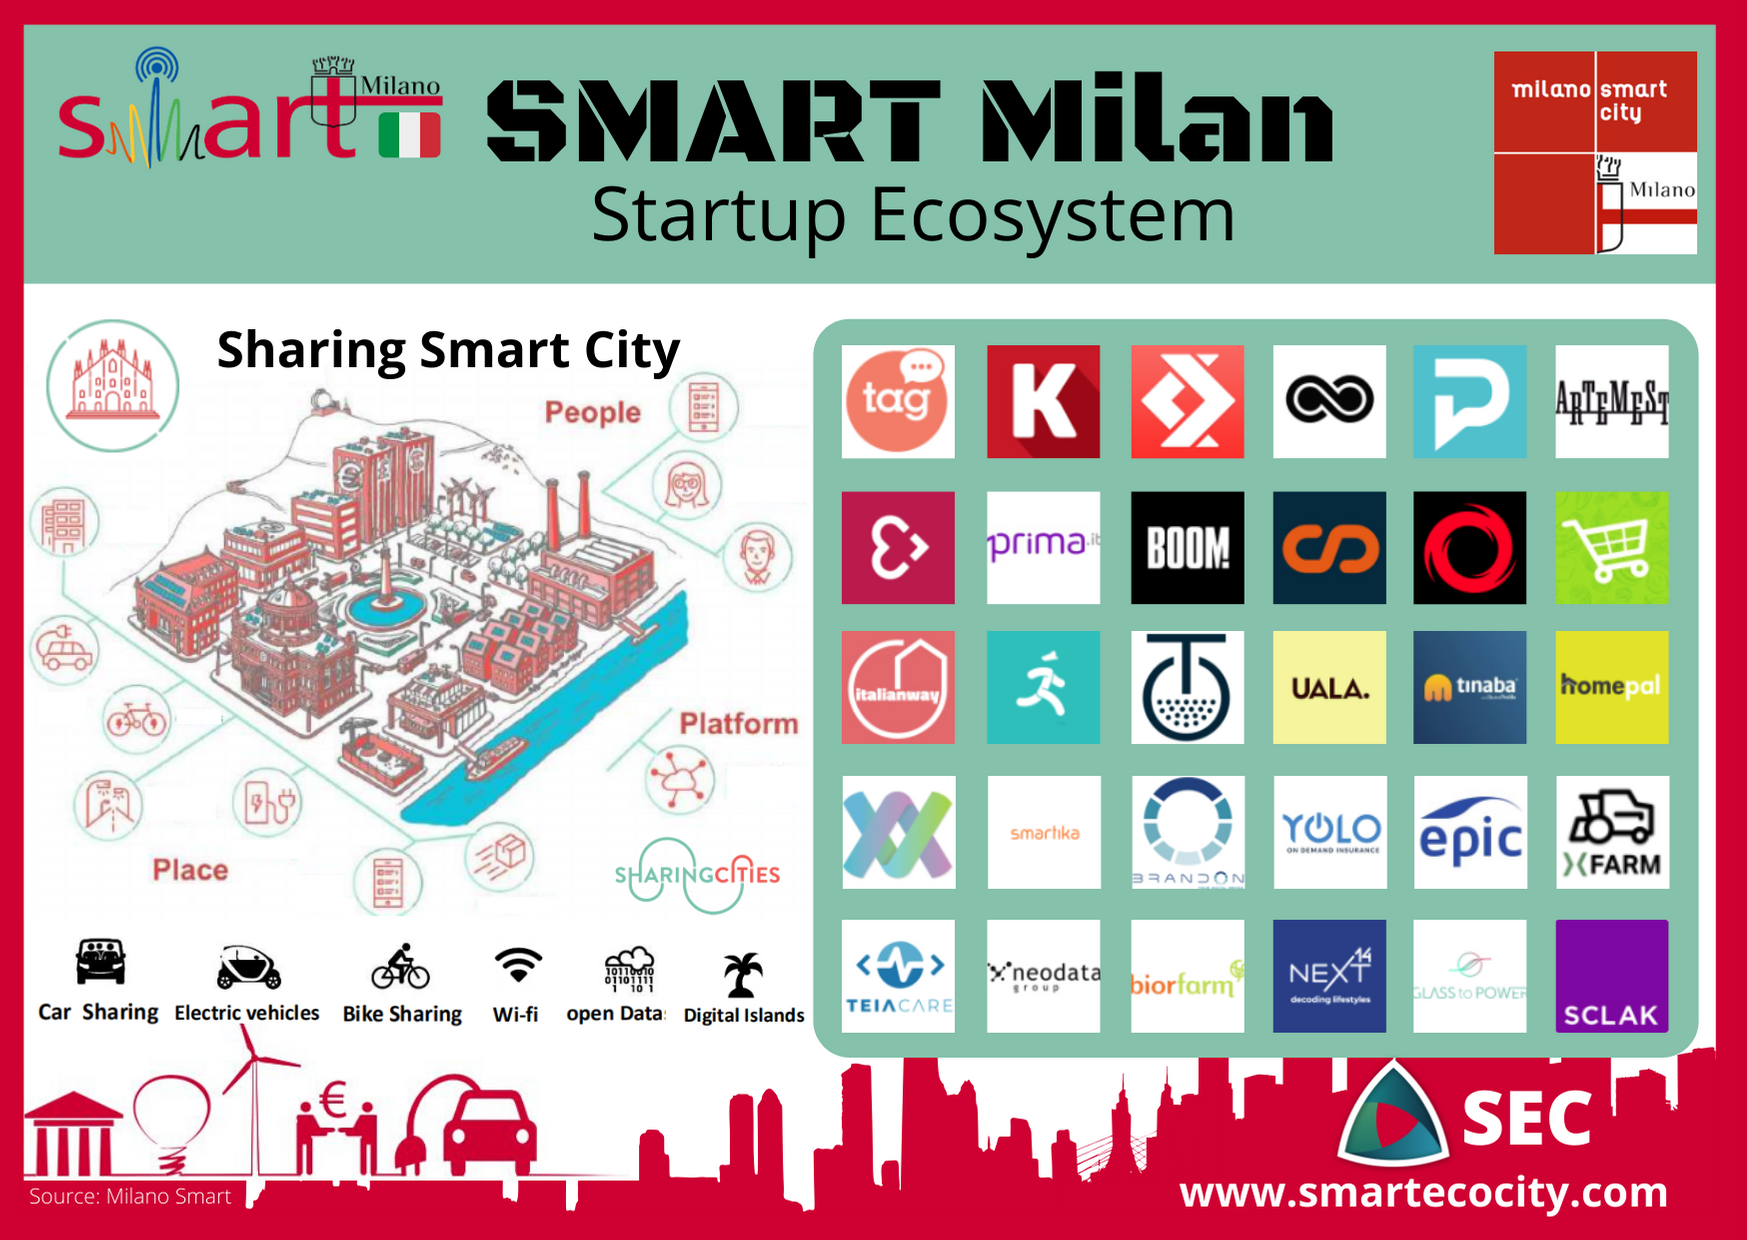 Milano Smart City